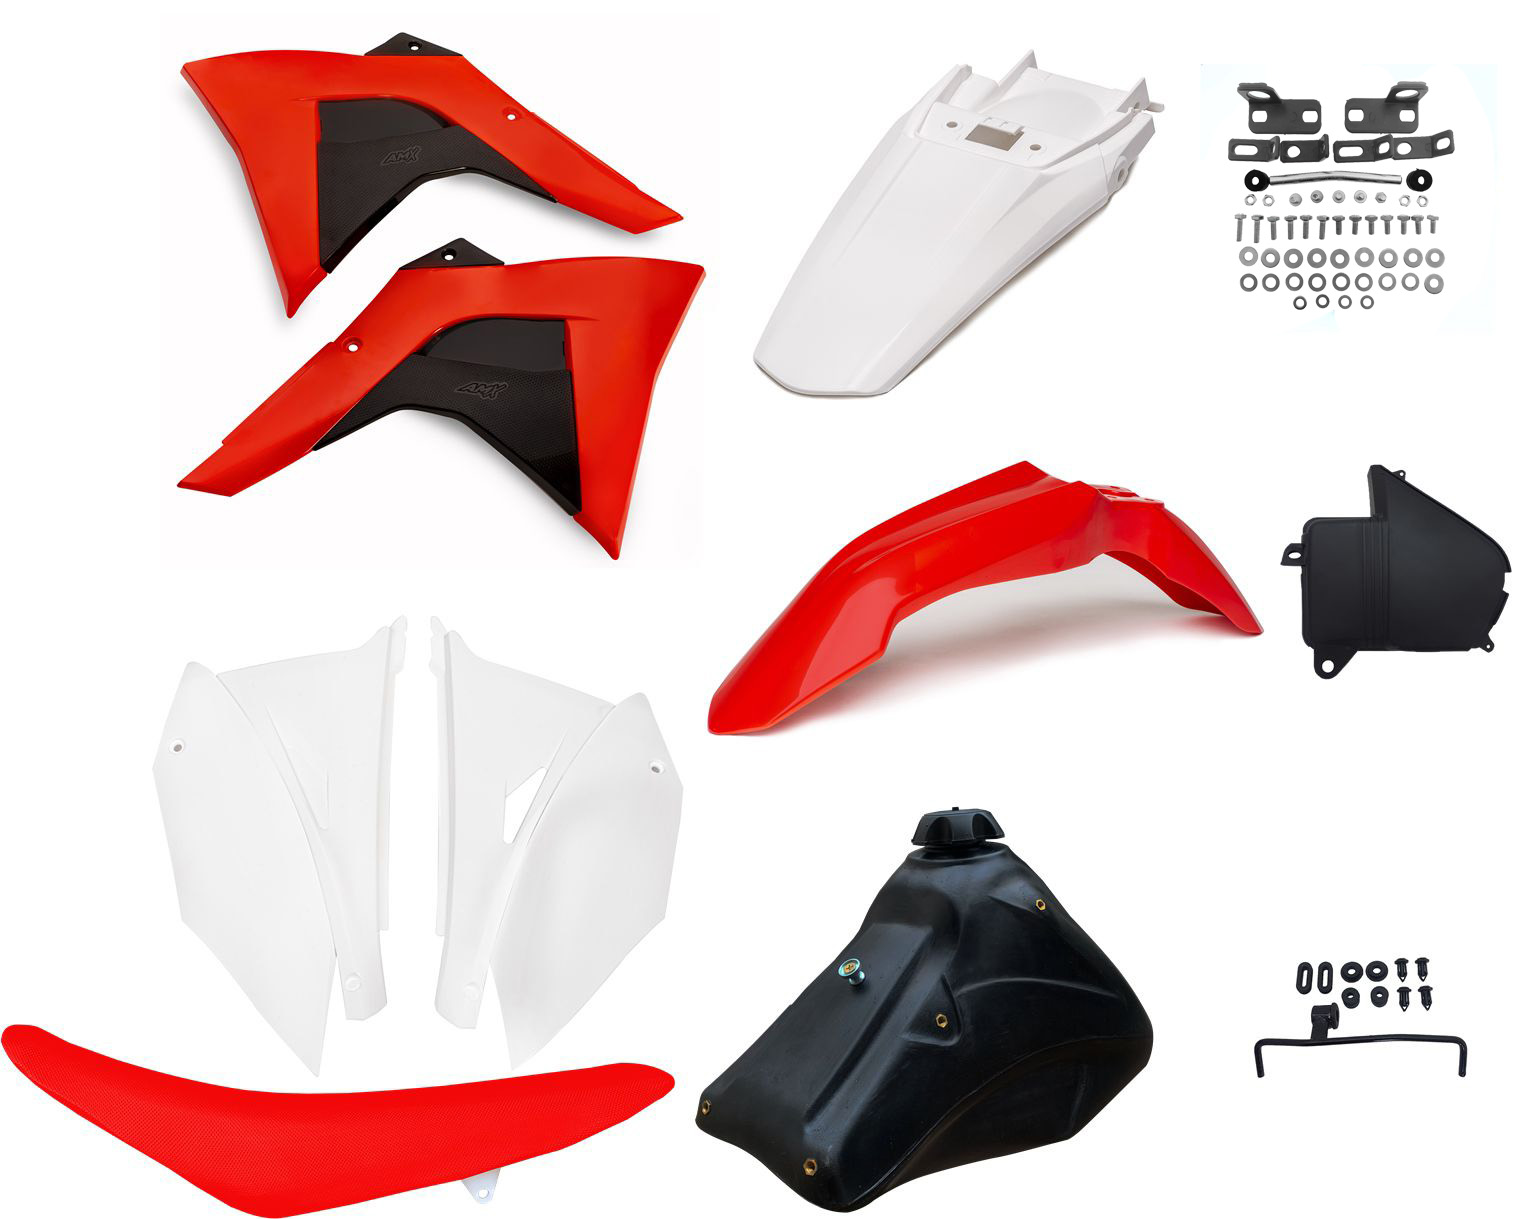 Kit Plástico Amx Adaptável Completo Crf 230 P/ Xr 200 Xr 250